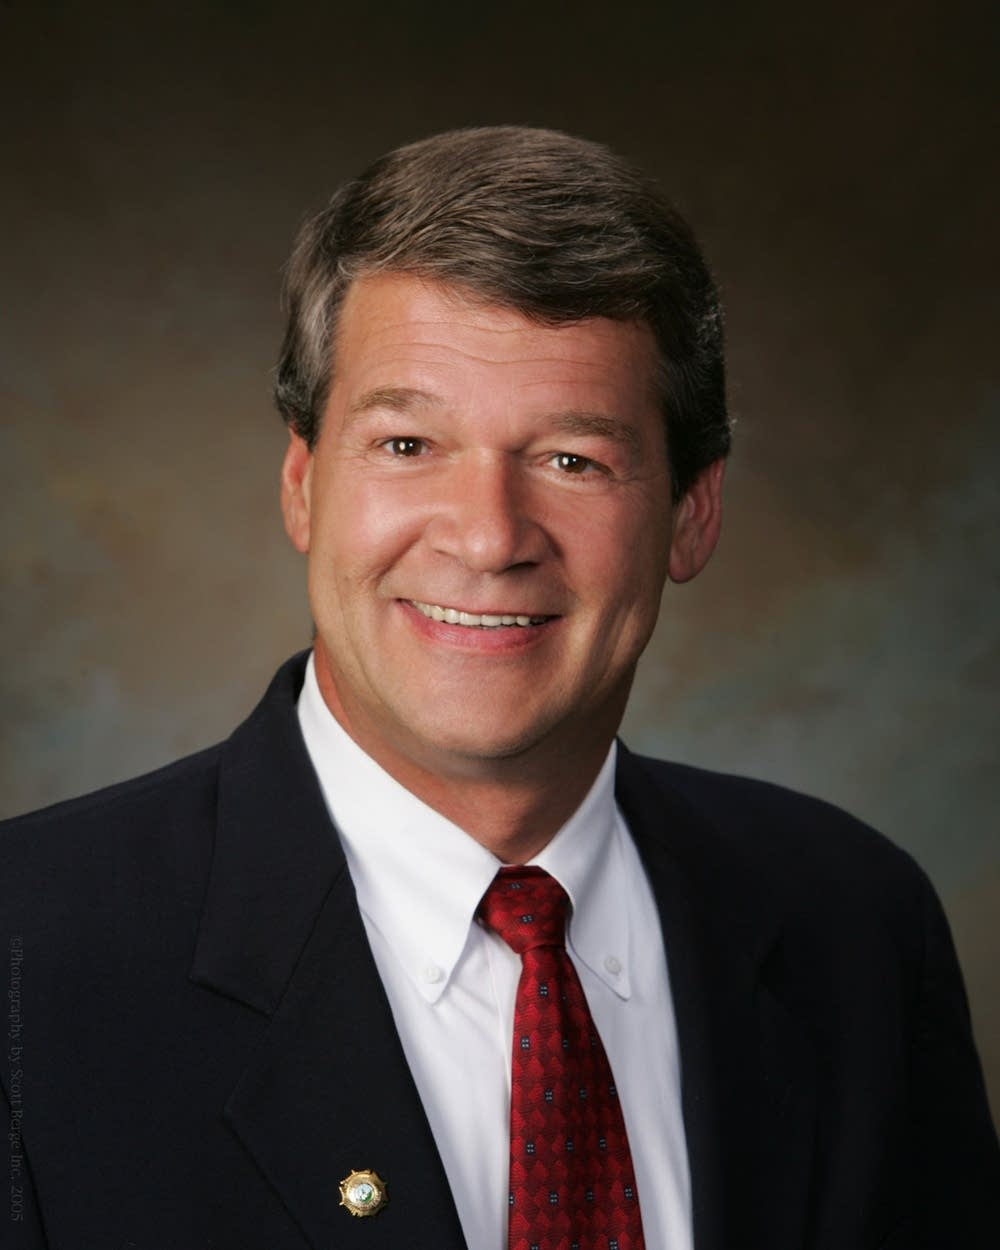 Wayne Stenehjem